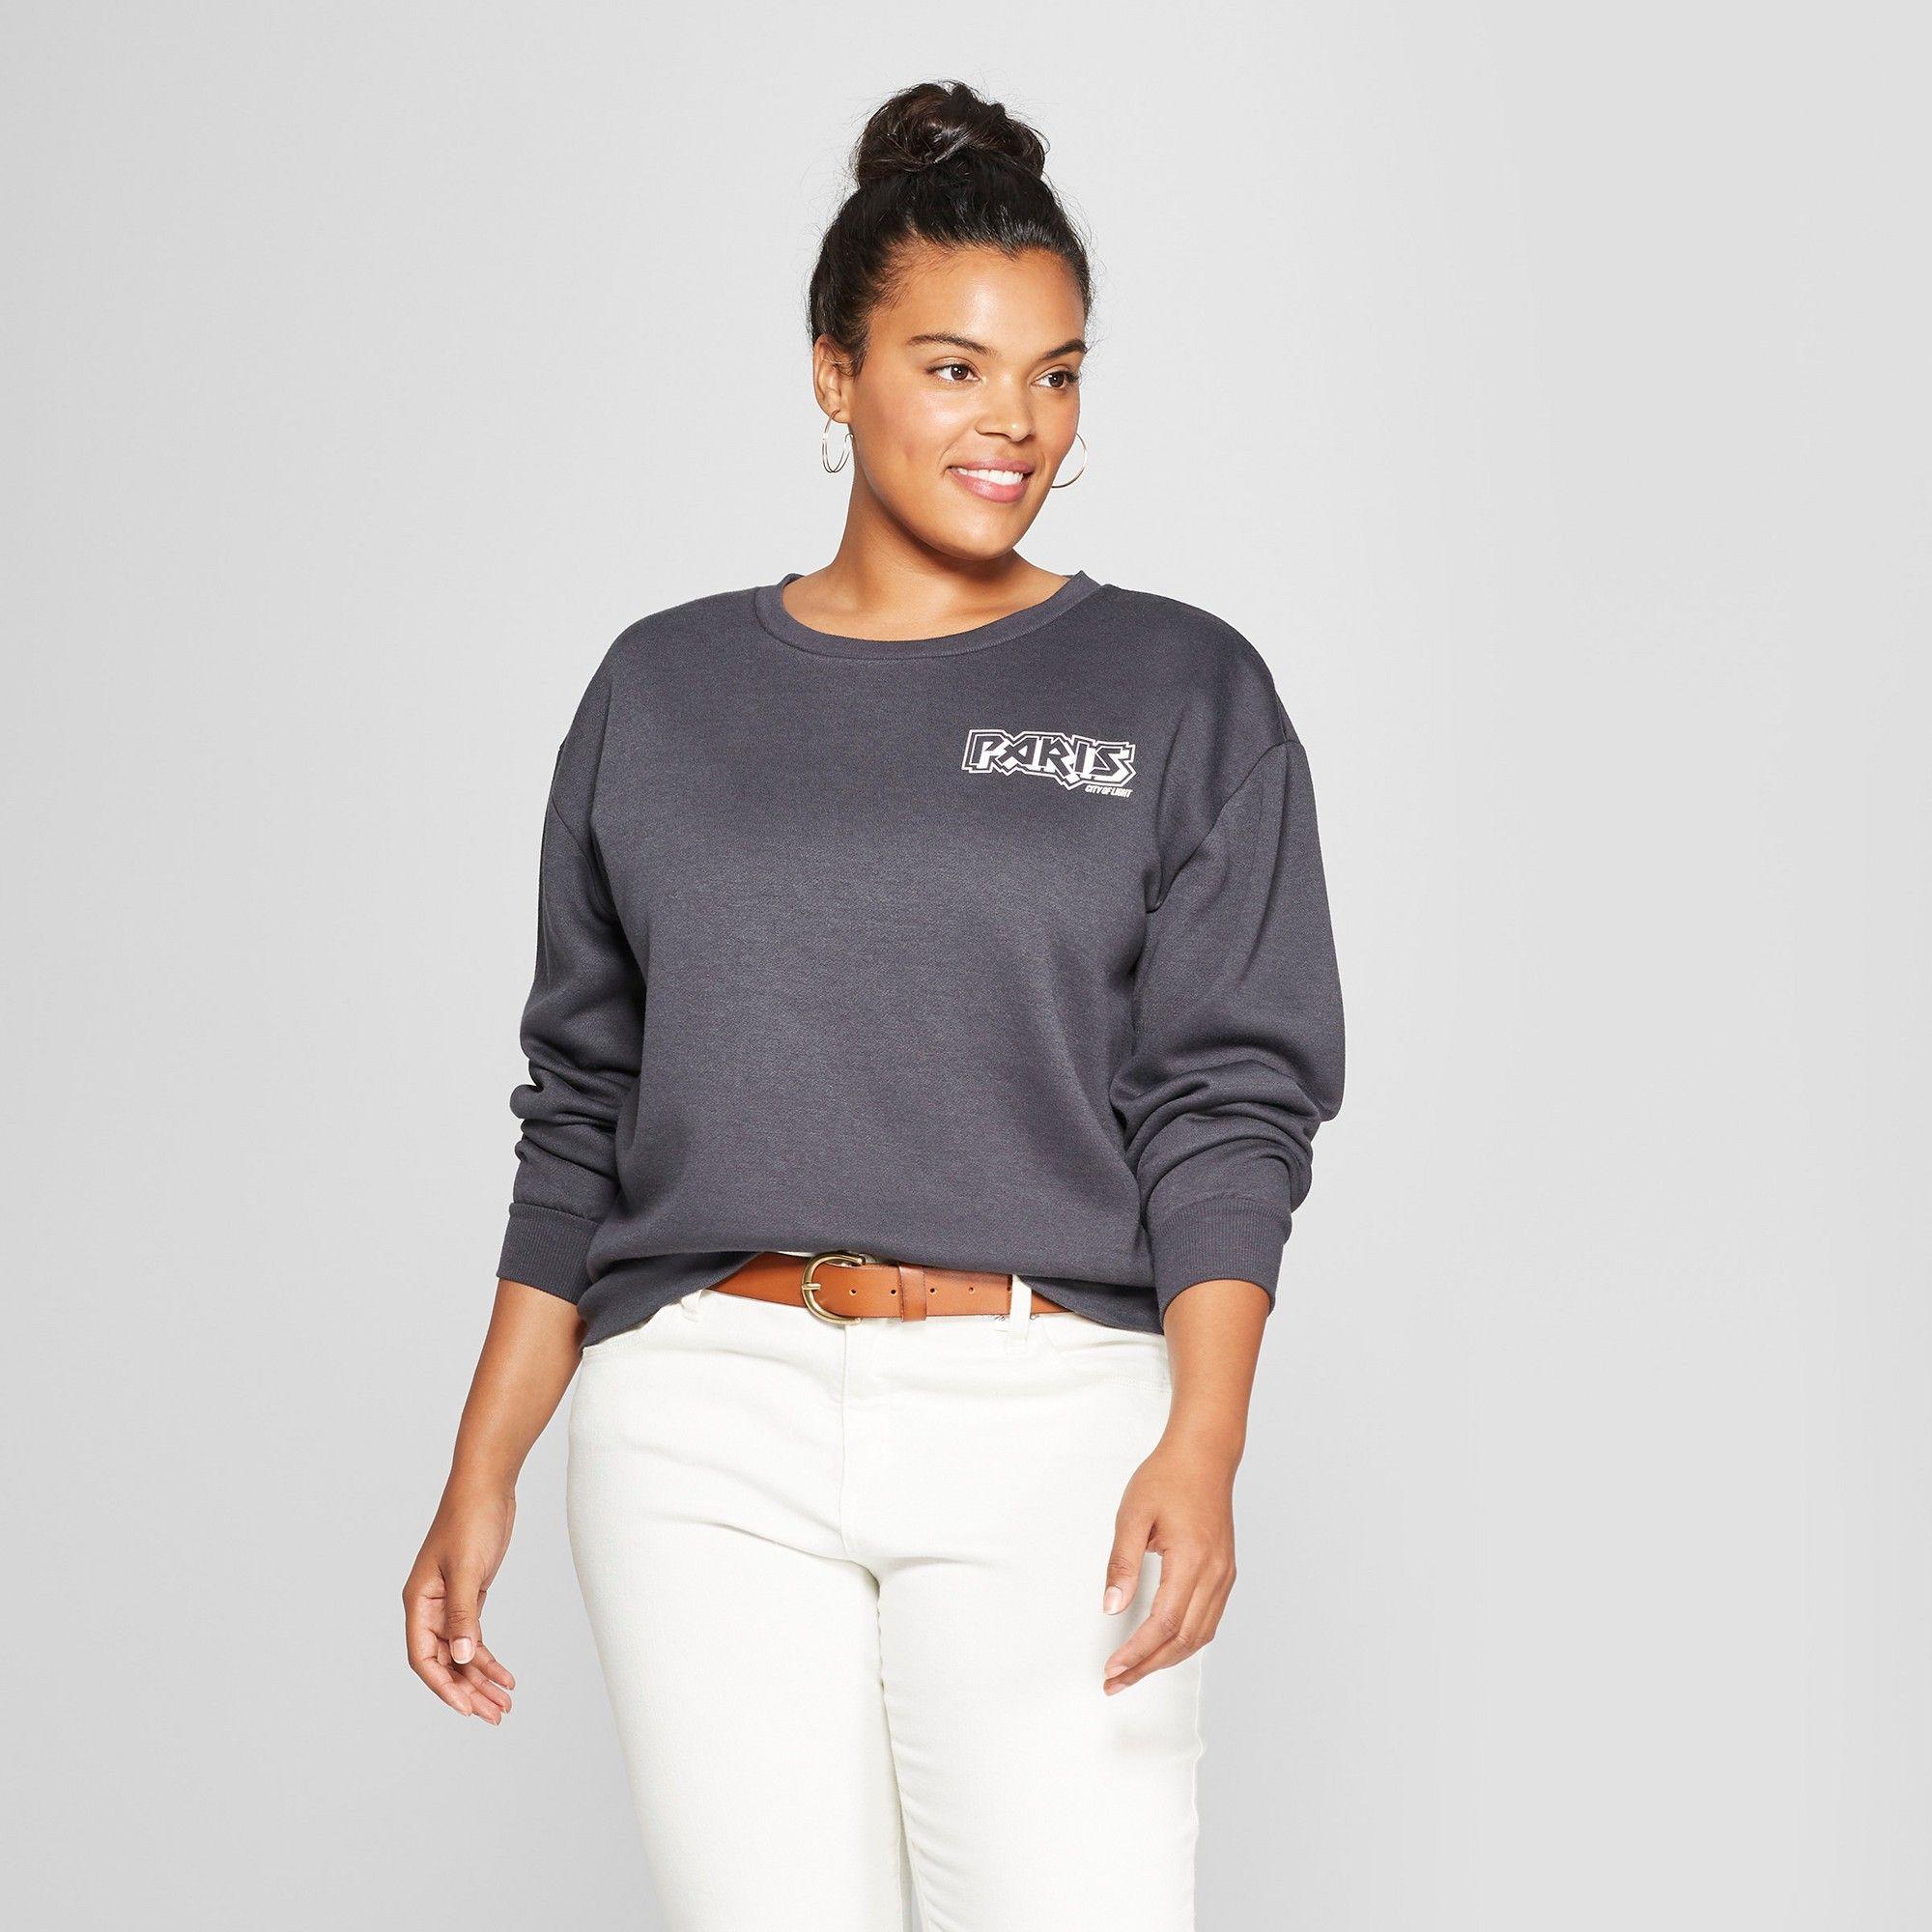 0f66f2db Women's Plus Size Paris France Cropped Graphic Sweatshirt - Mighty Fine  (Juniors') Black 3X